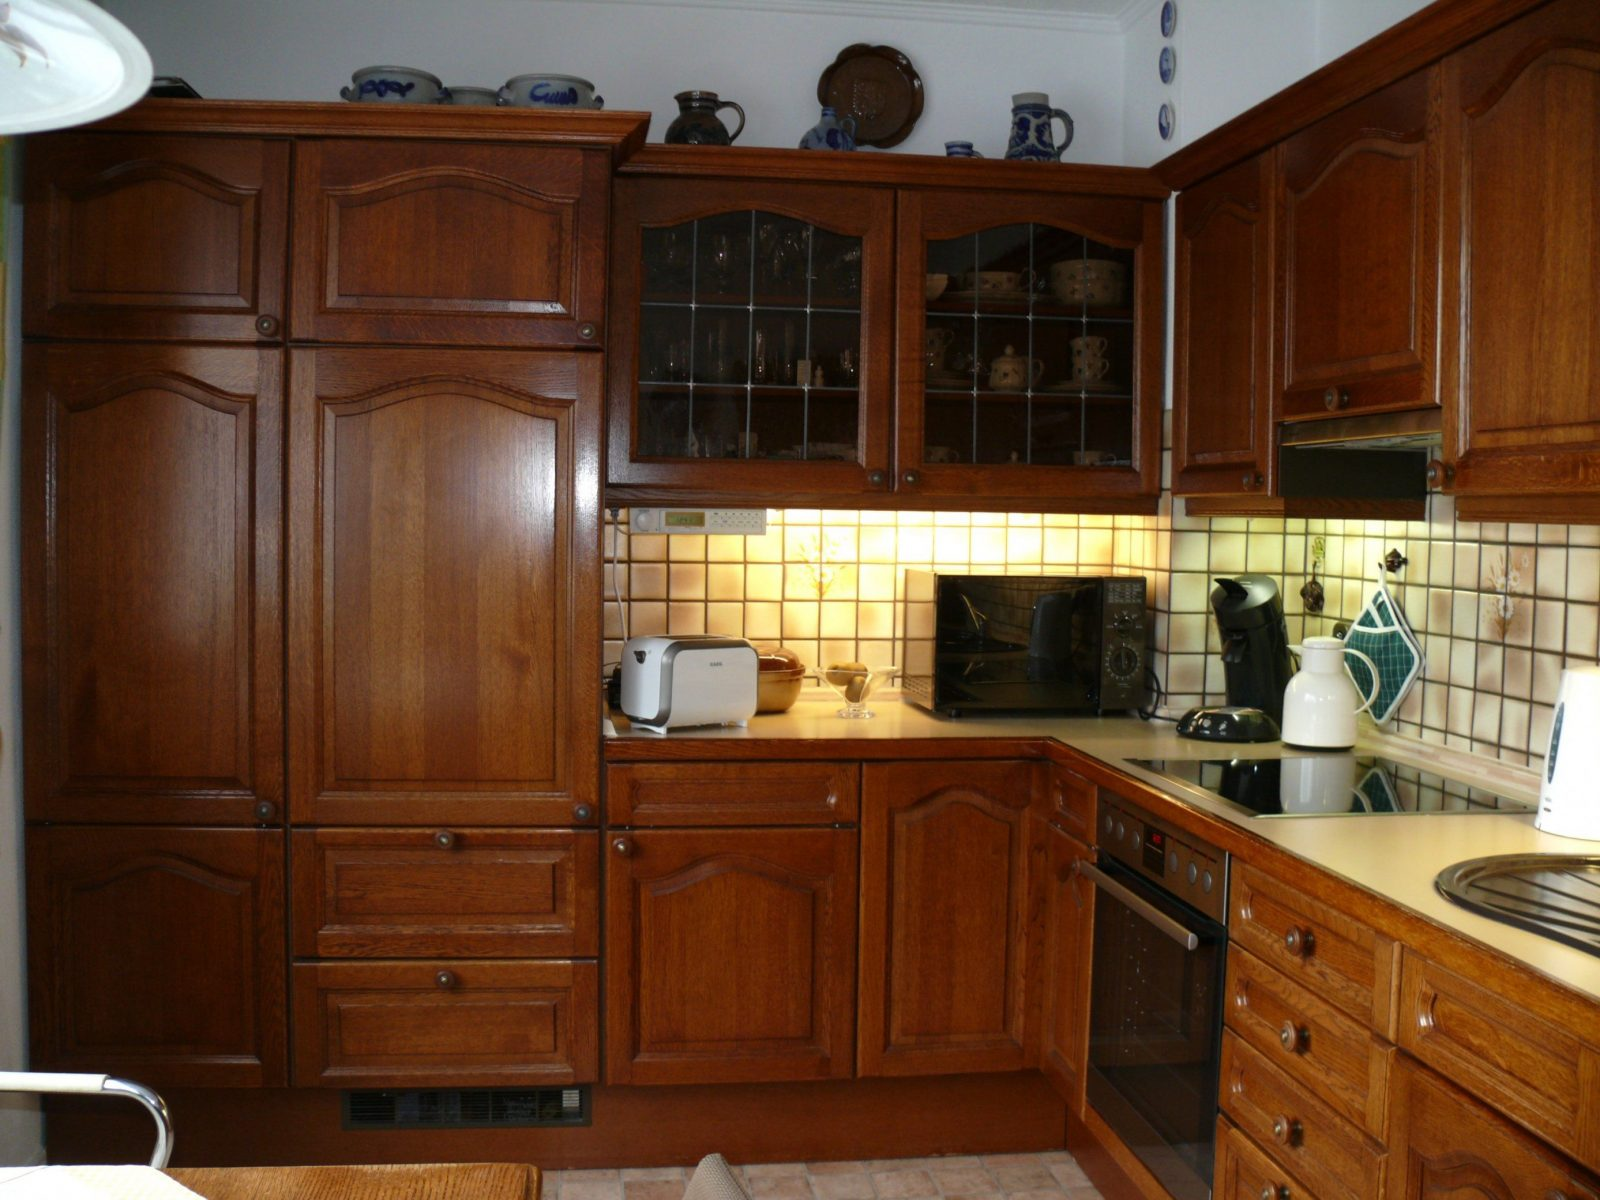 Genial Kuche Eiche Rustikal Modernisieren Familienzimmer Bild A von Küche Eiche Rustikal Modernisieren Bild